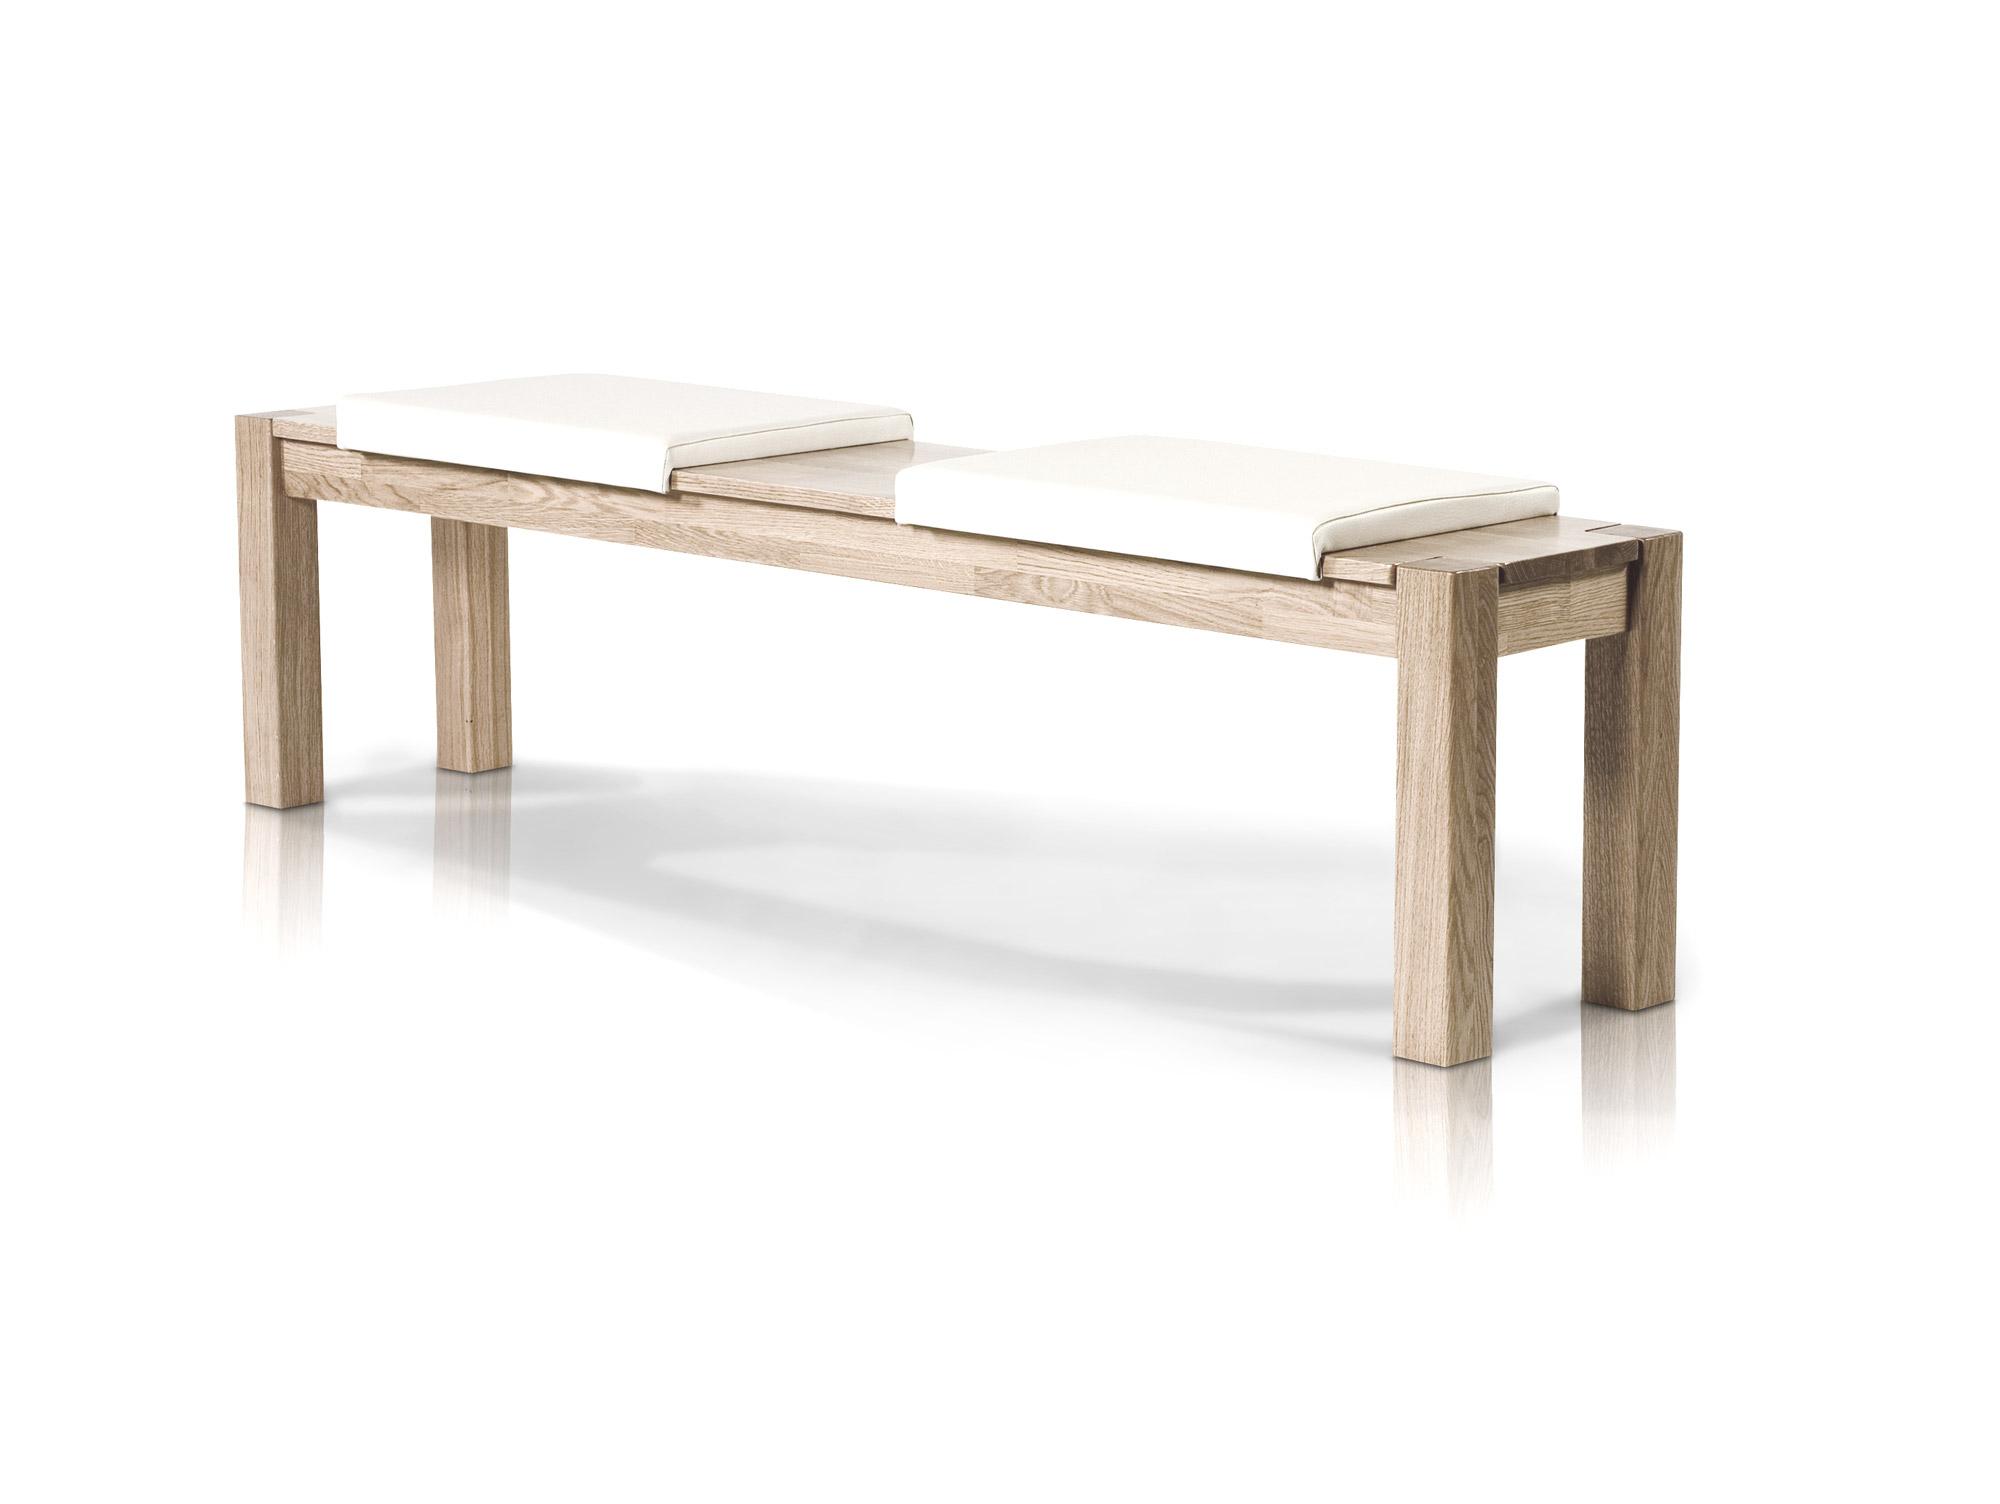 timo sitzbank vollmassiv 140 x 35 cm eiche sonoma lackiert. Black Bedroom Furniture Sets. Home Design Ideas